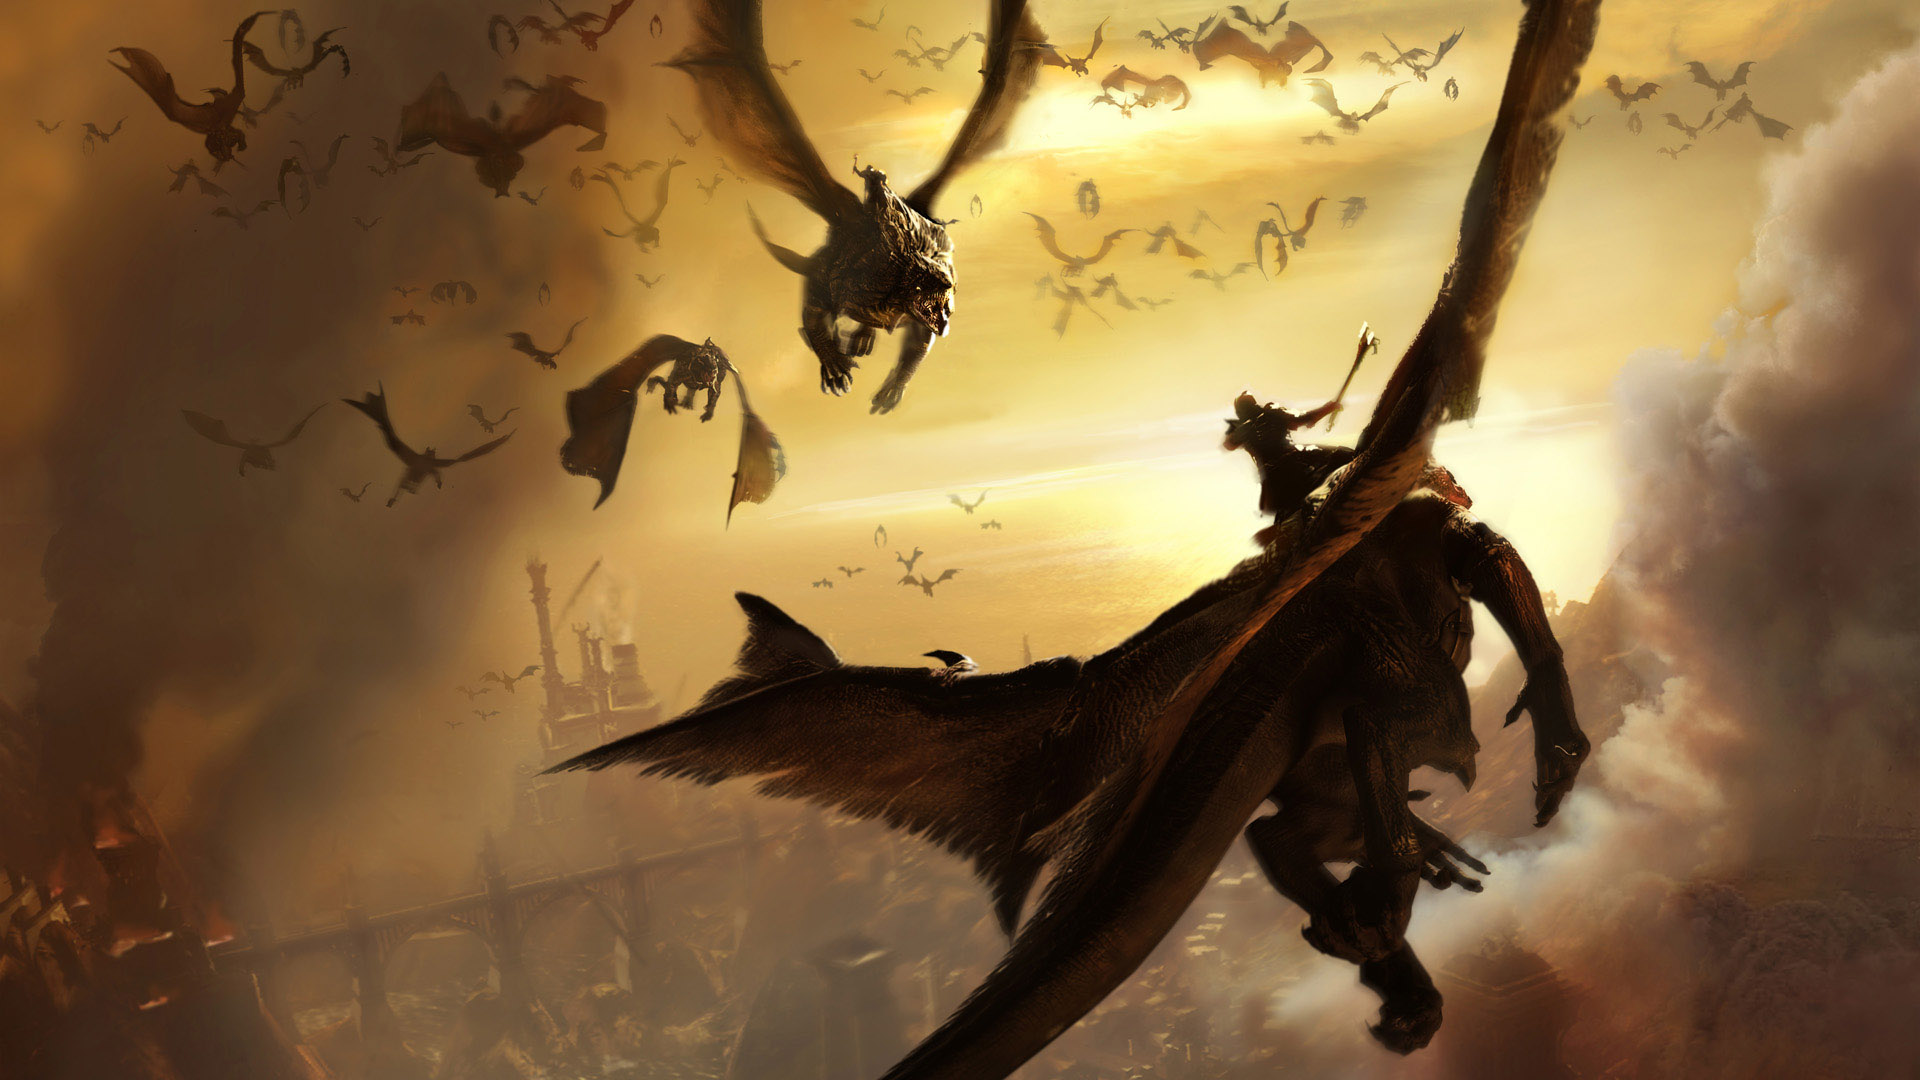 Dragon Backgrounds Great Dragon Wallpaper 8300